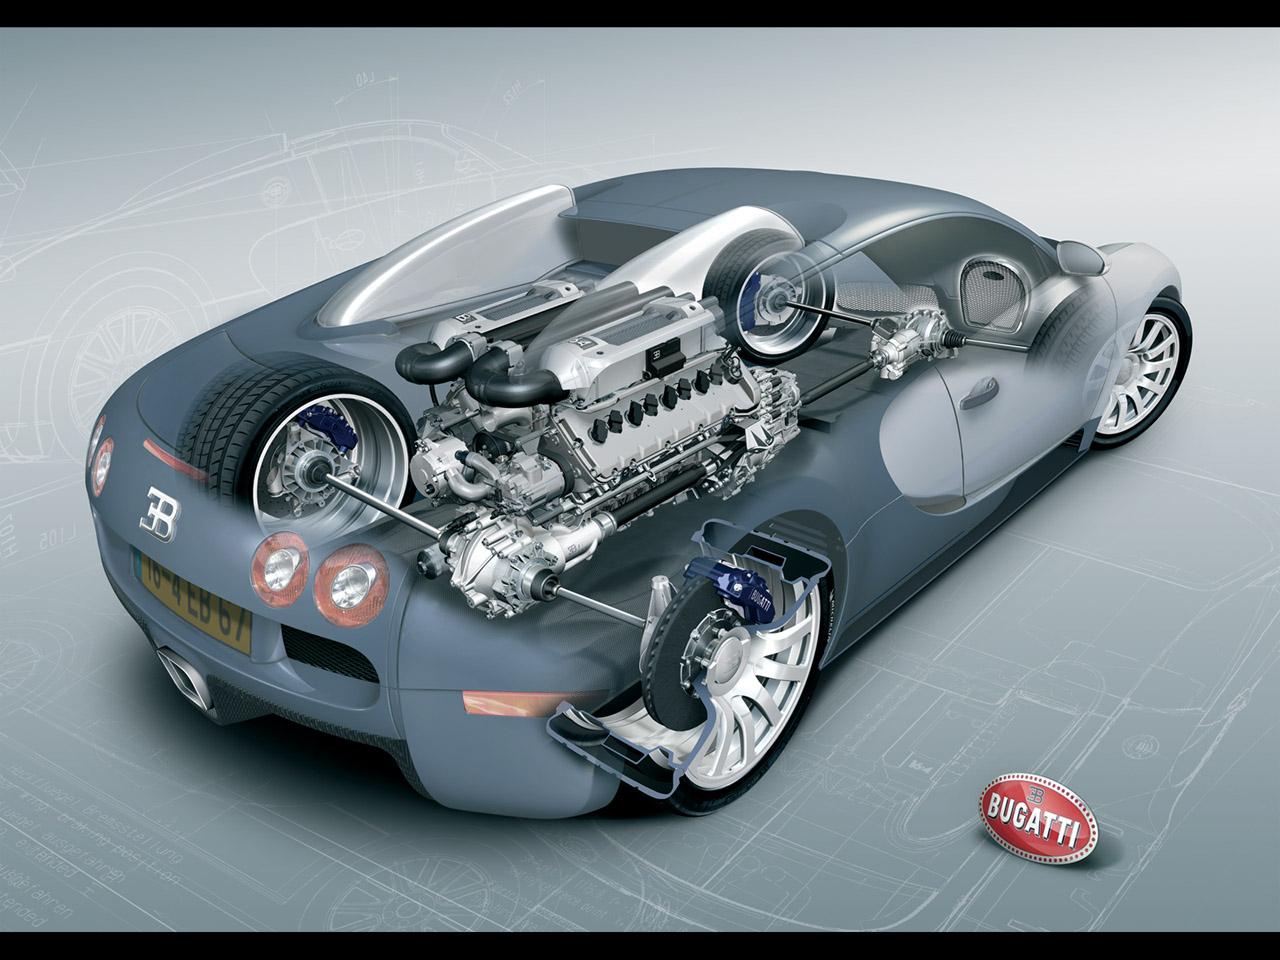 http://2.bp.blogspot.com/_S6hIoFvUuK8/S_cHcVgz2UI/AAAAAAAAAKg/7Up0cWyDysc/s1600/2006-Bugatti-Veyron-W16-RA-Cutaway-1280x960.jpg